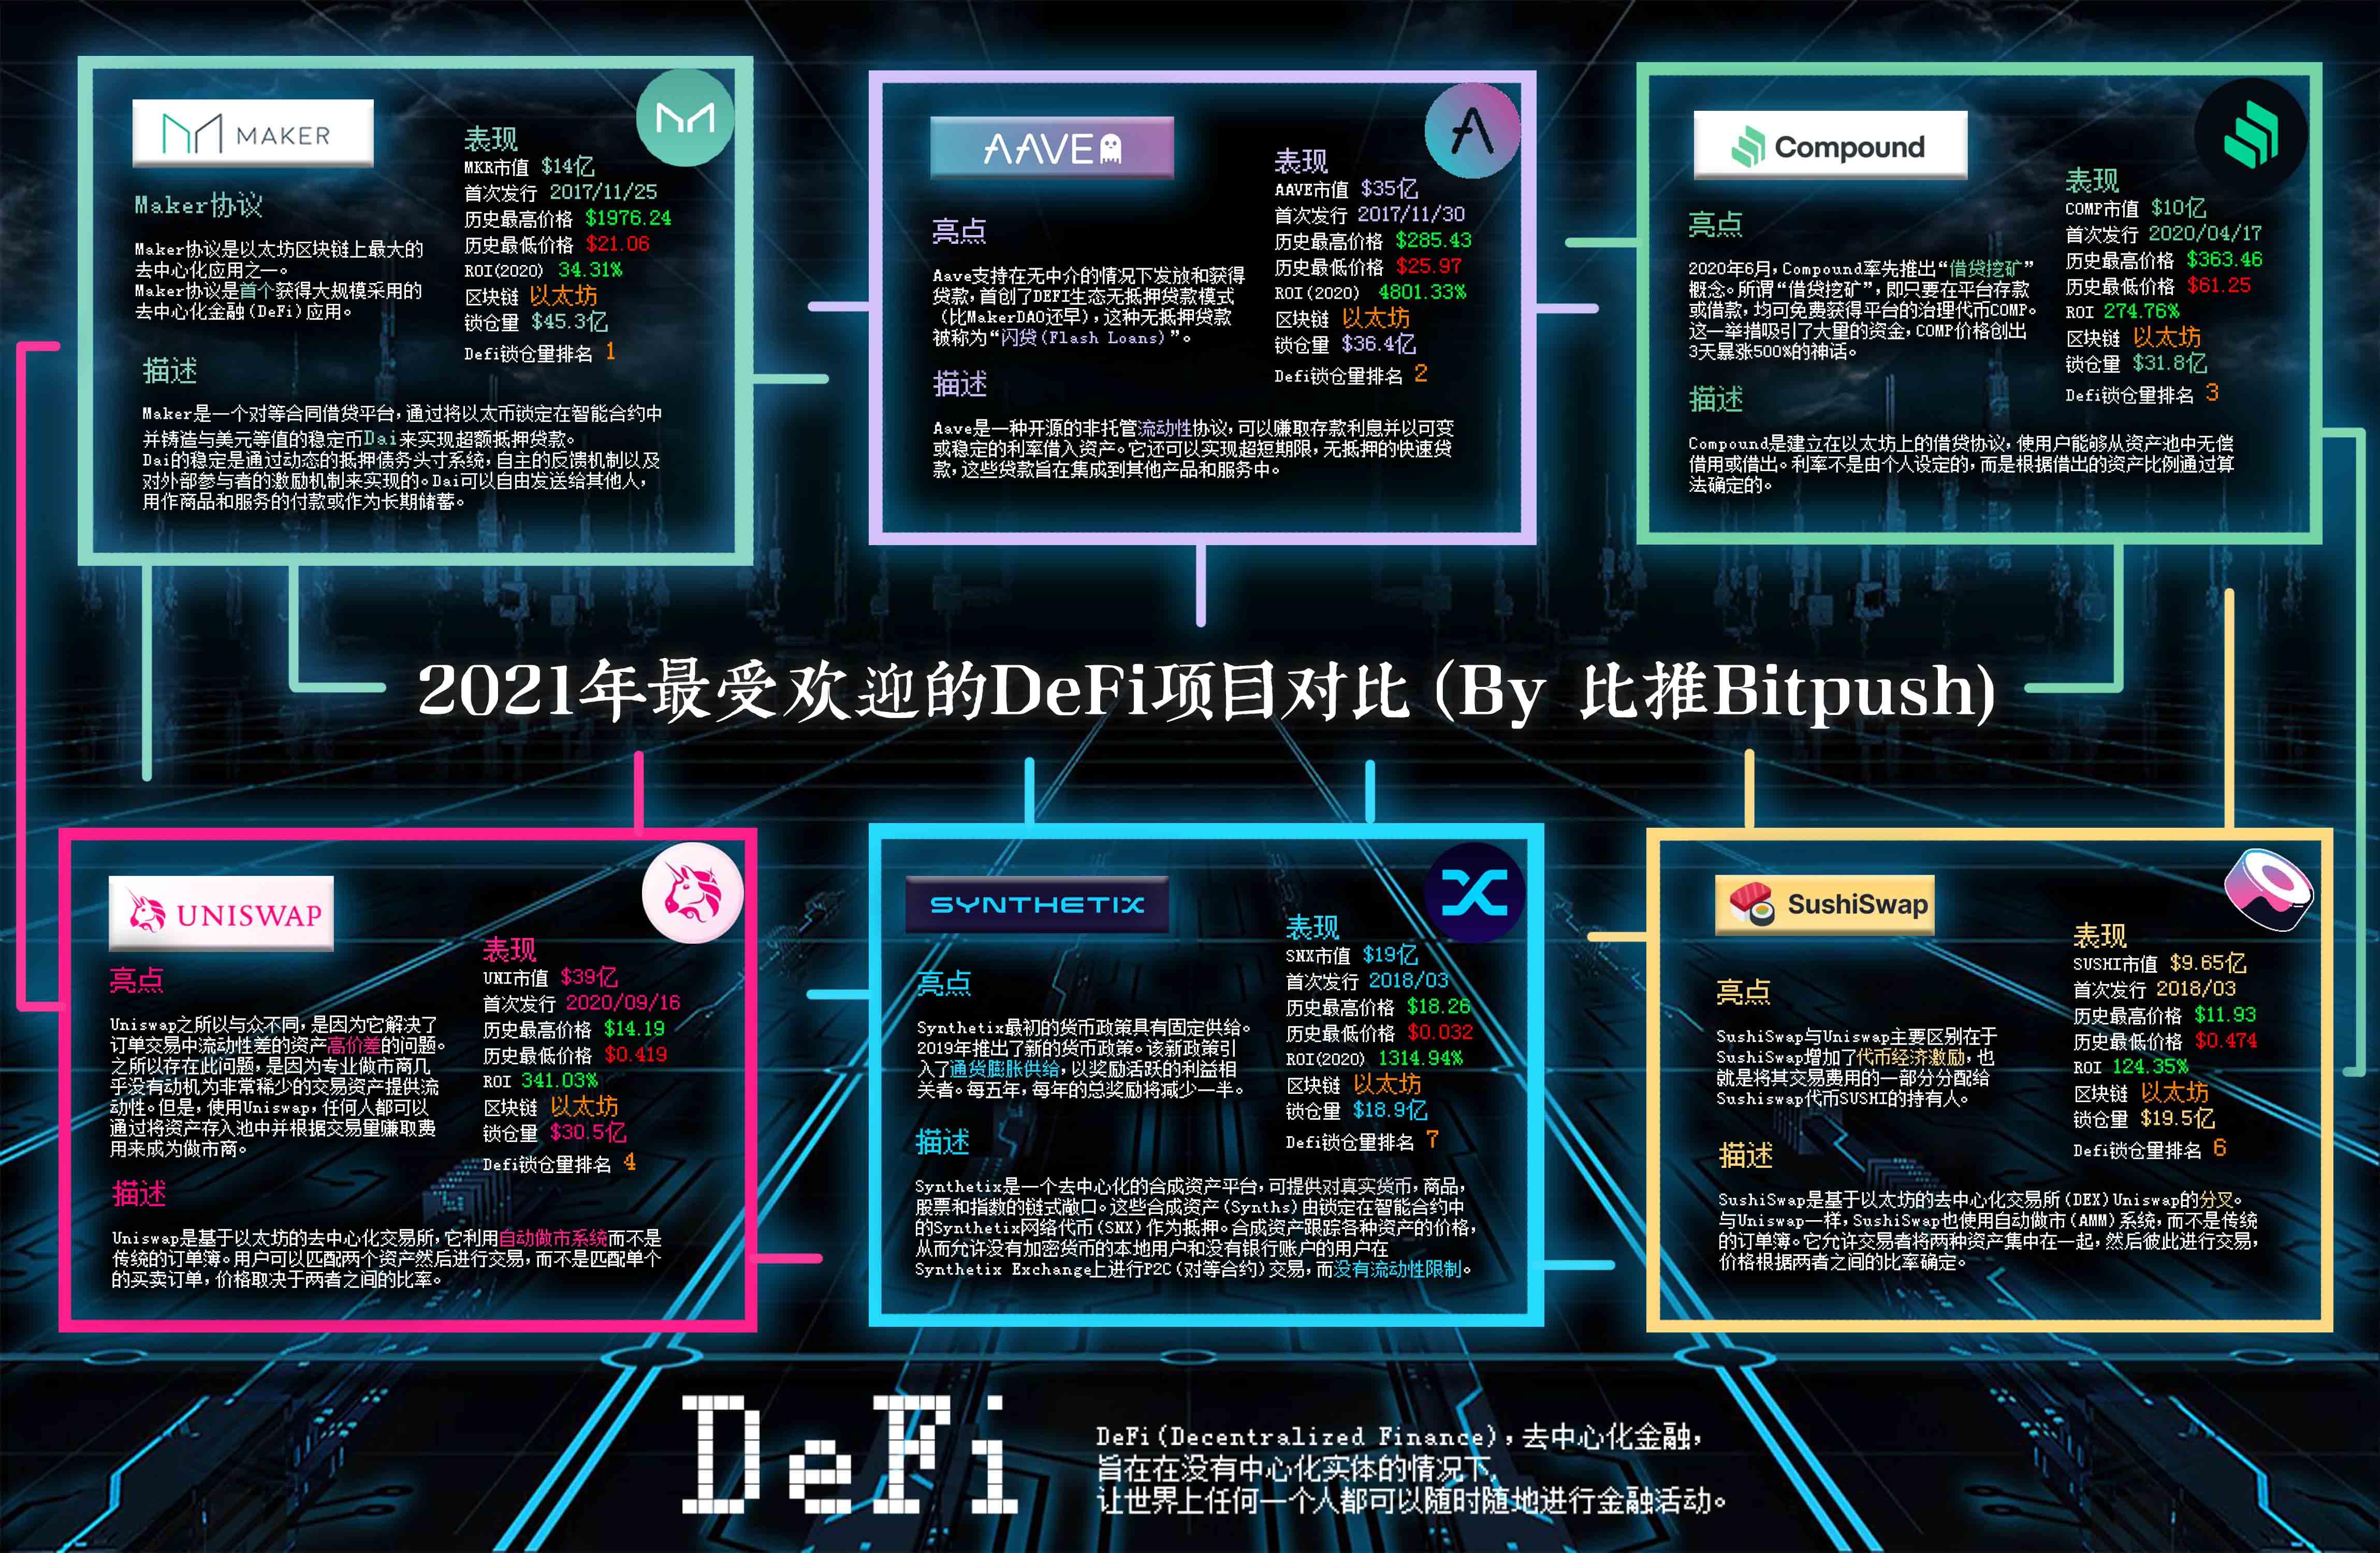 httpsimages.bitpush.news202101special_cn-20210127-161176510949220898.jpghhh.jpg